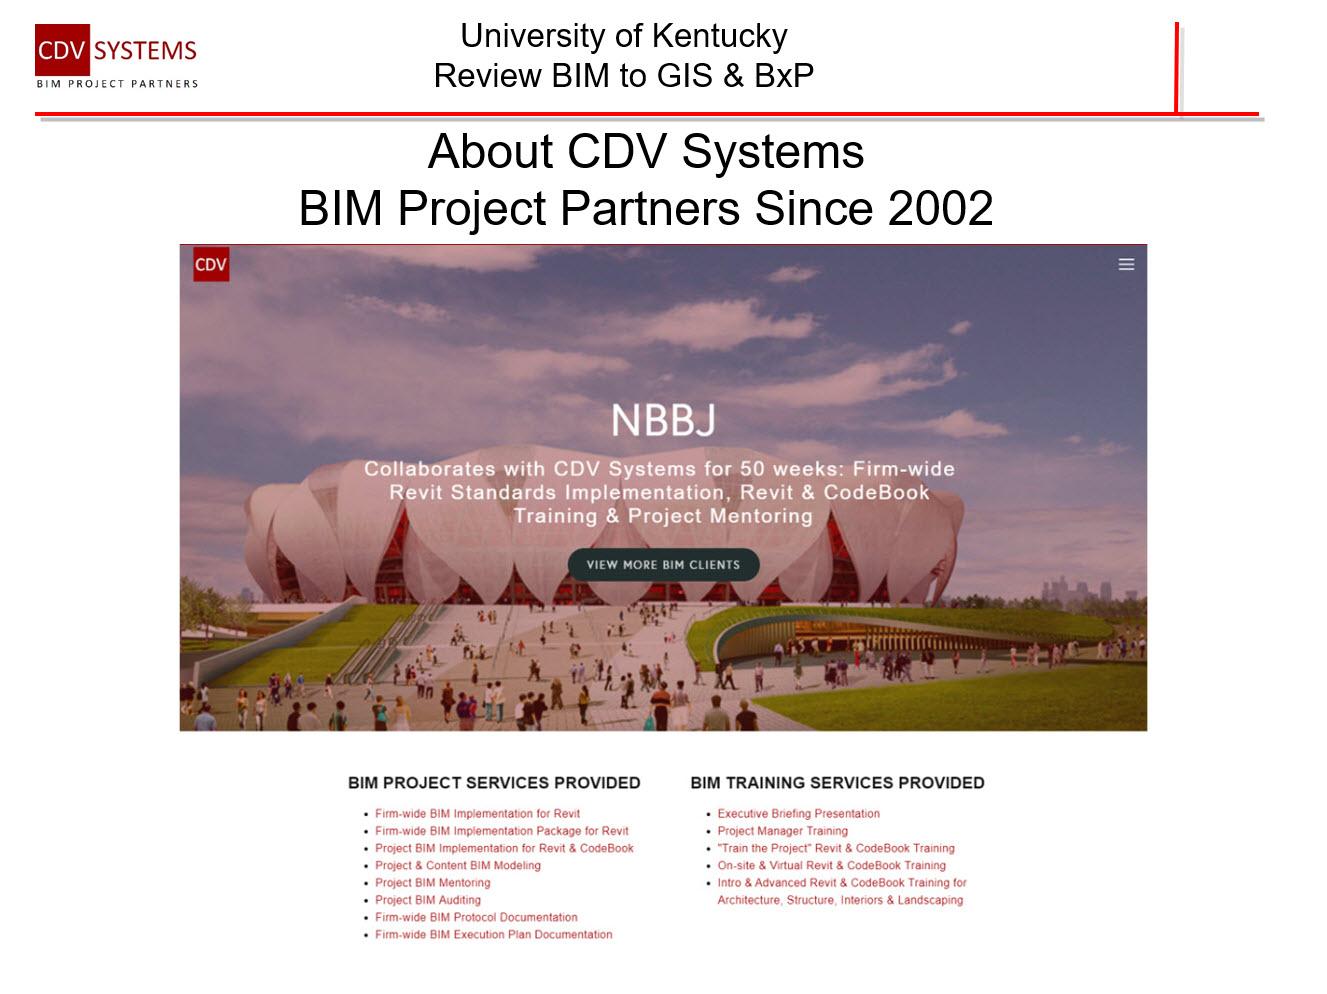 University of Kentucky_001m.jpg